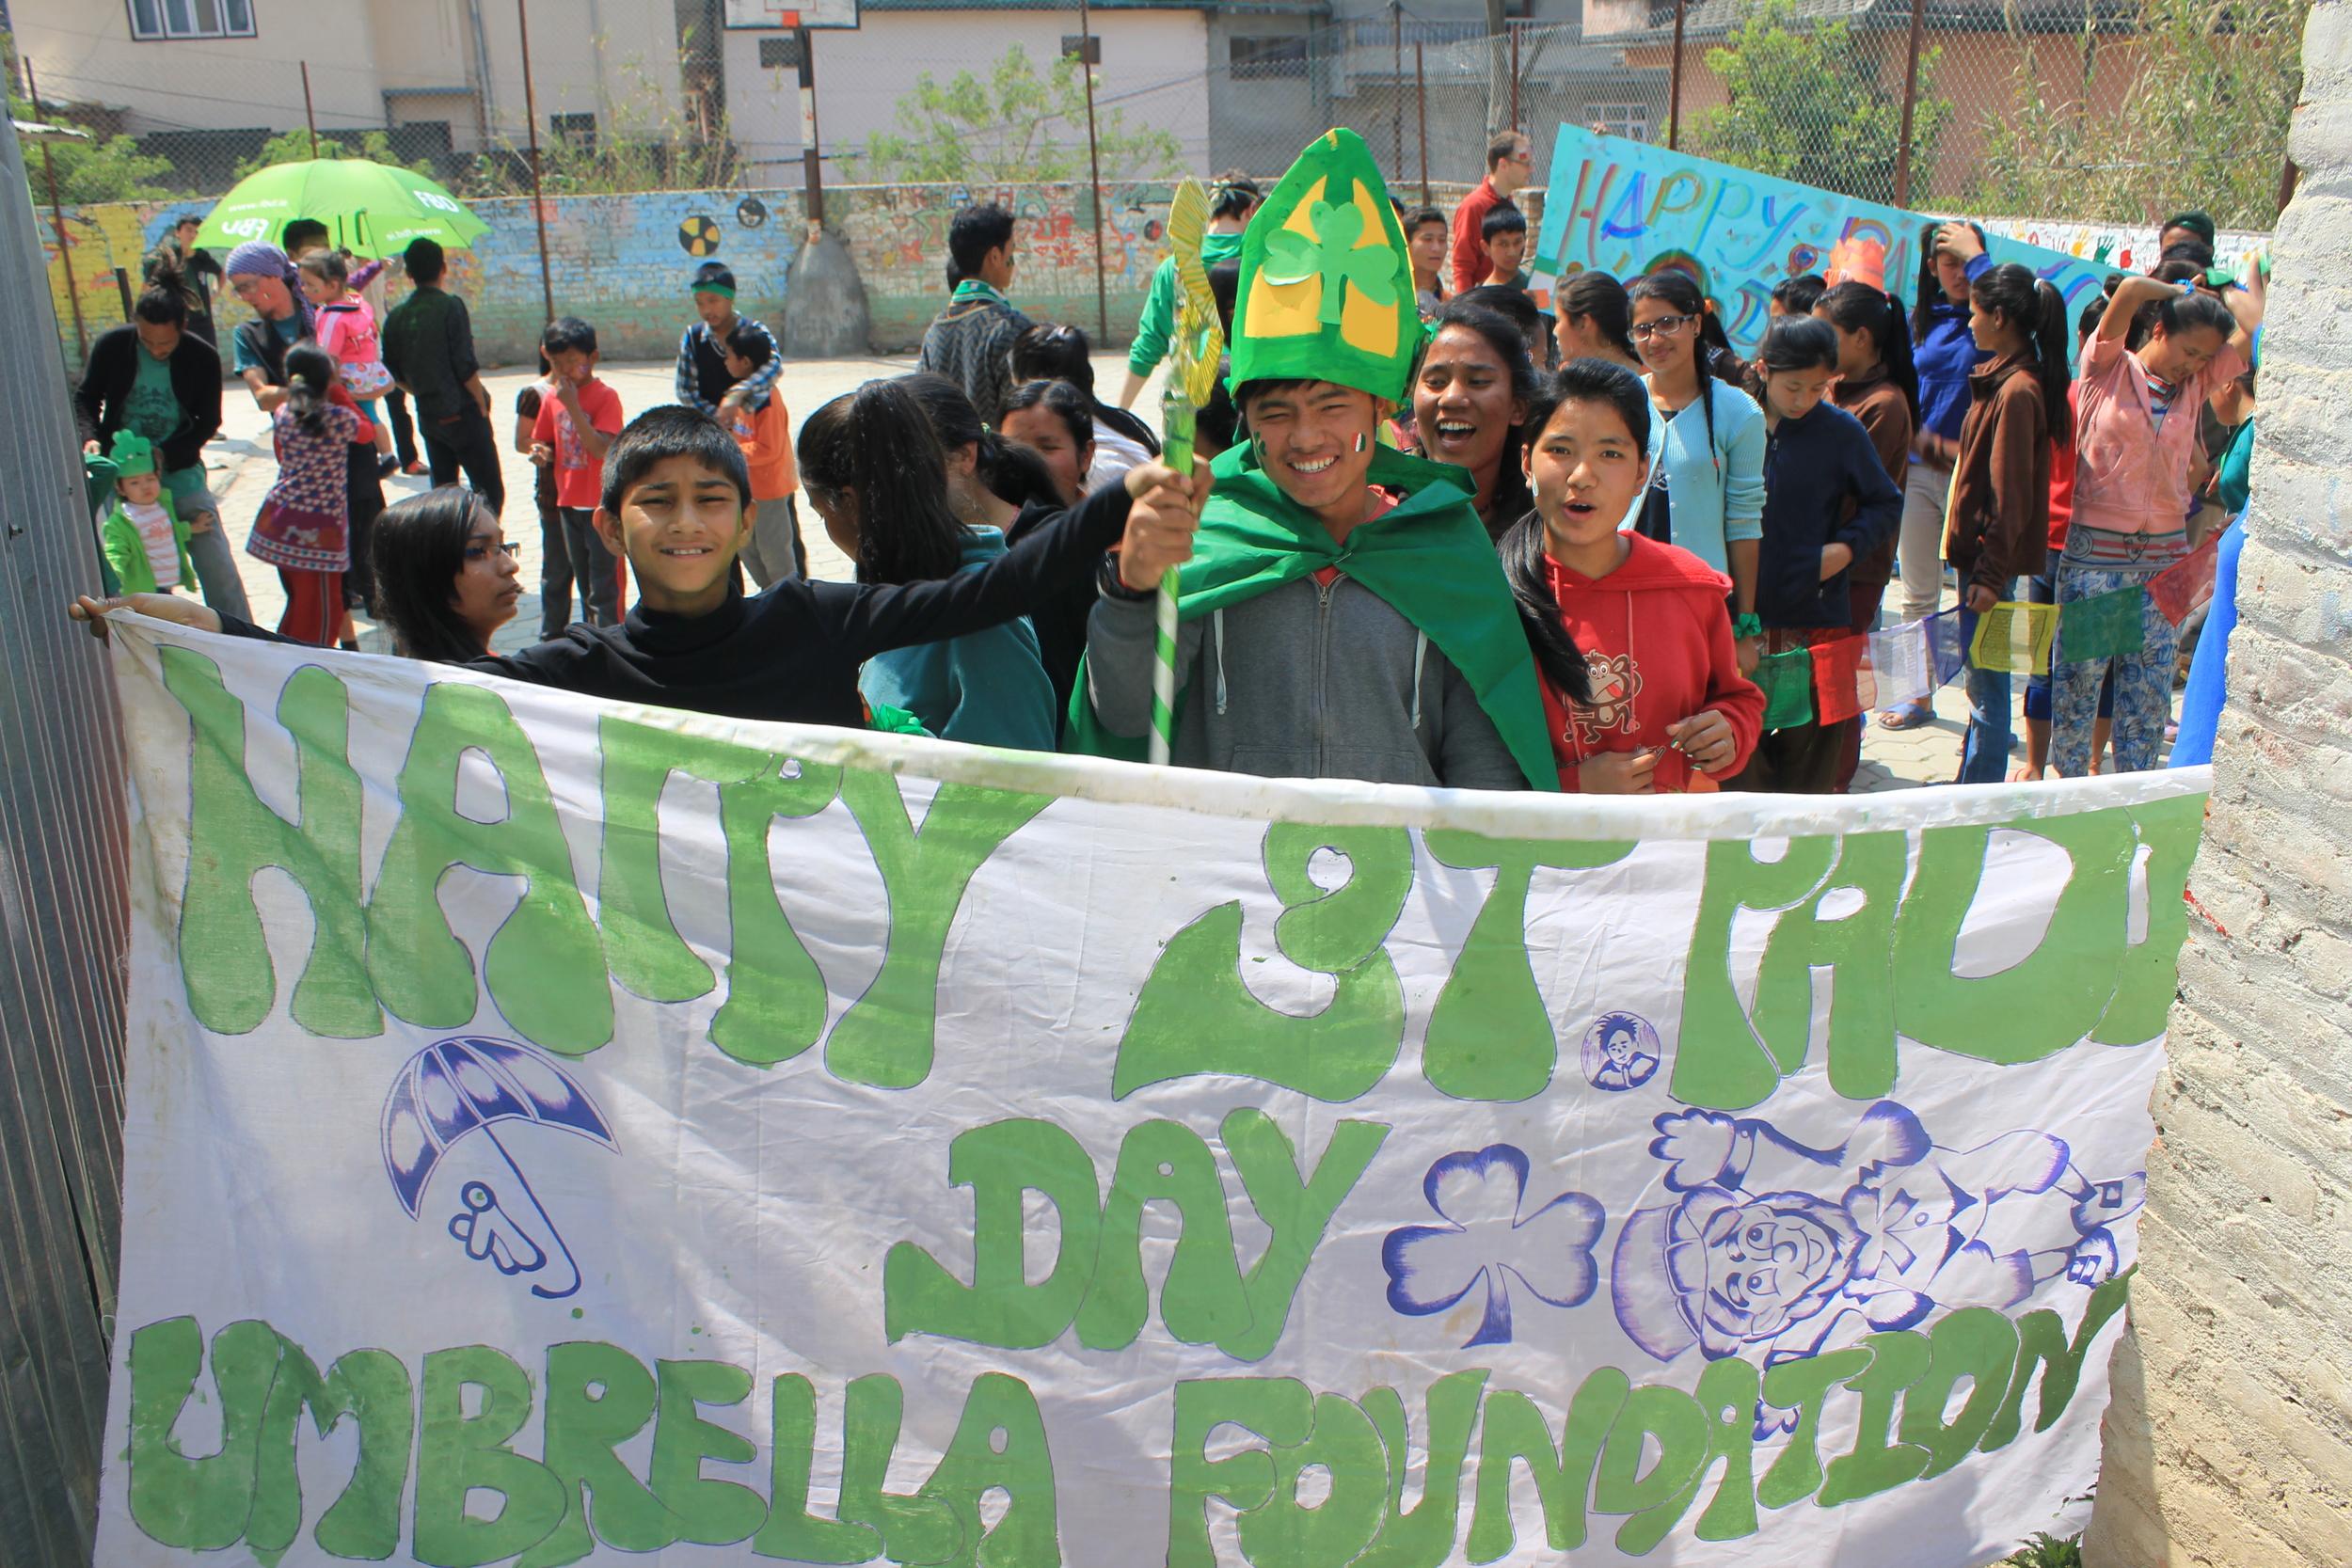 St Patrick leading the way....